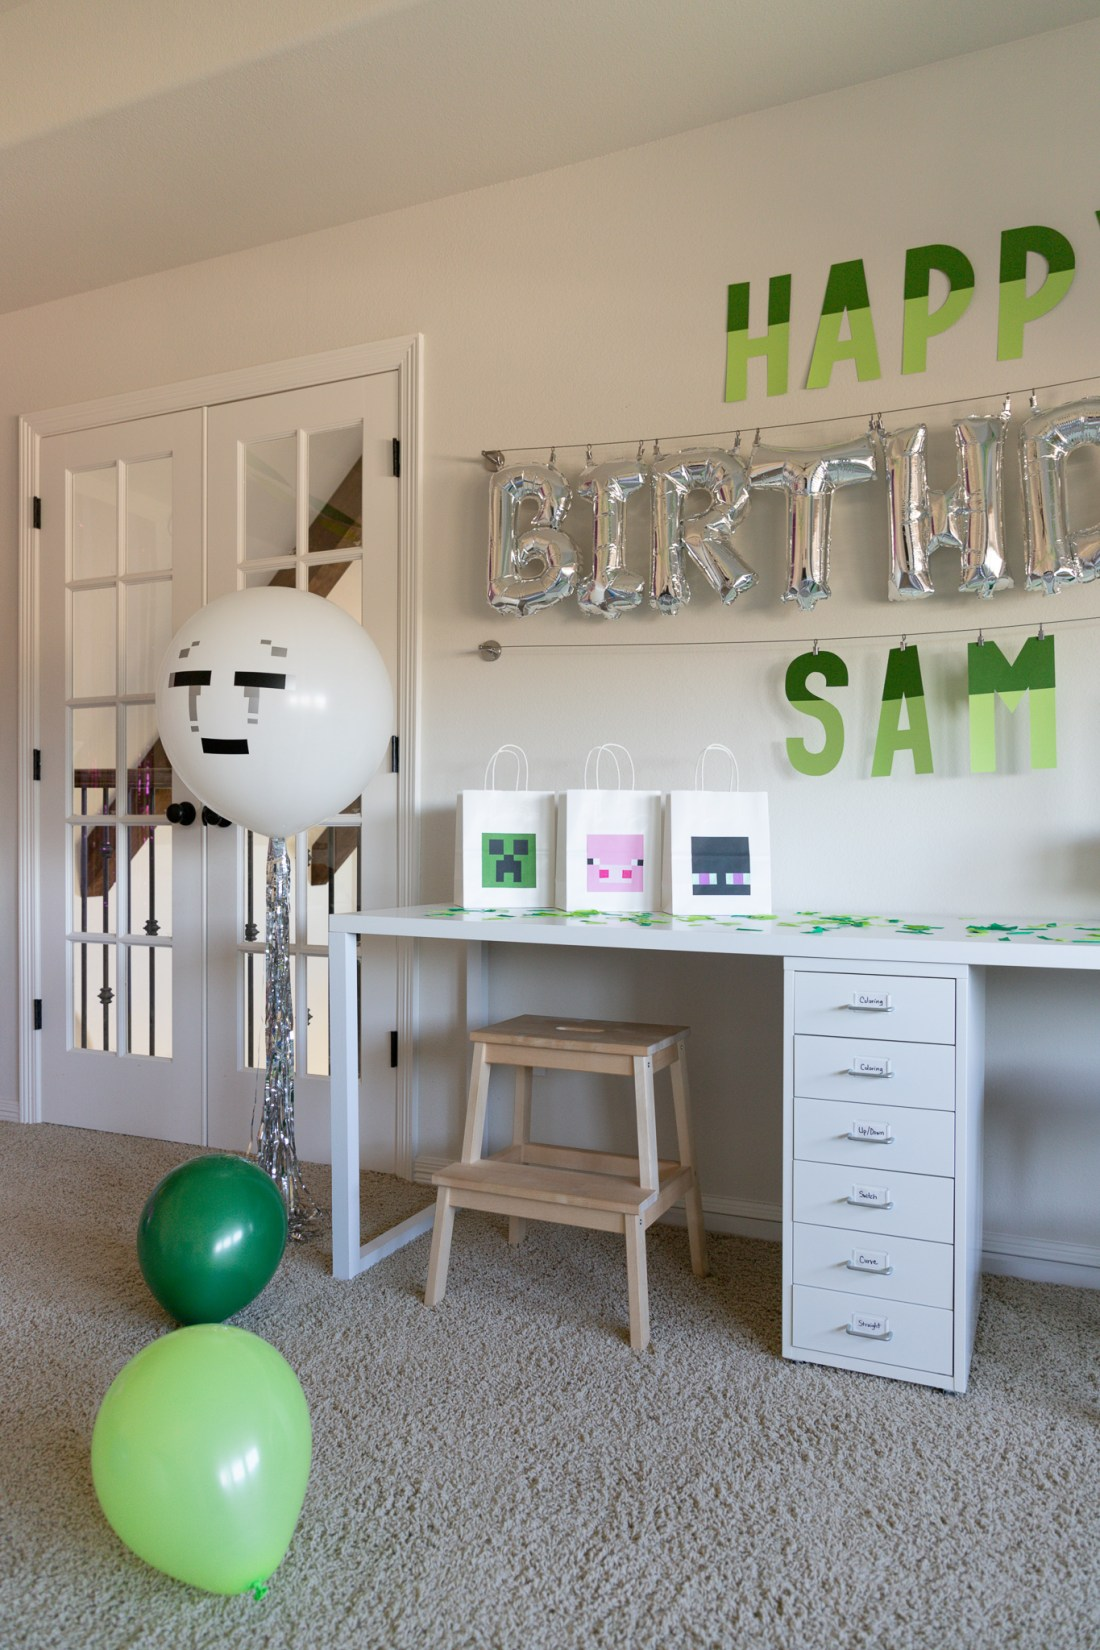 Minecraft Decoration Ideas For Birthday from i2.wp.com